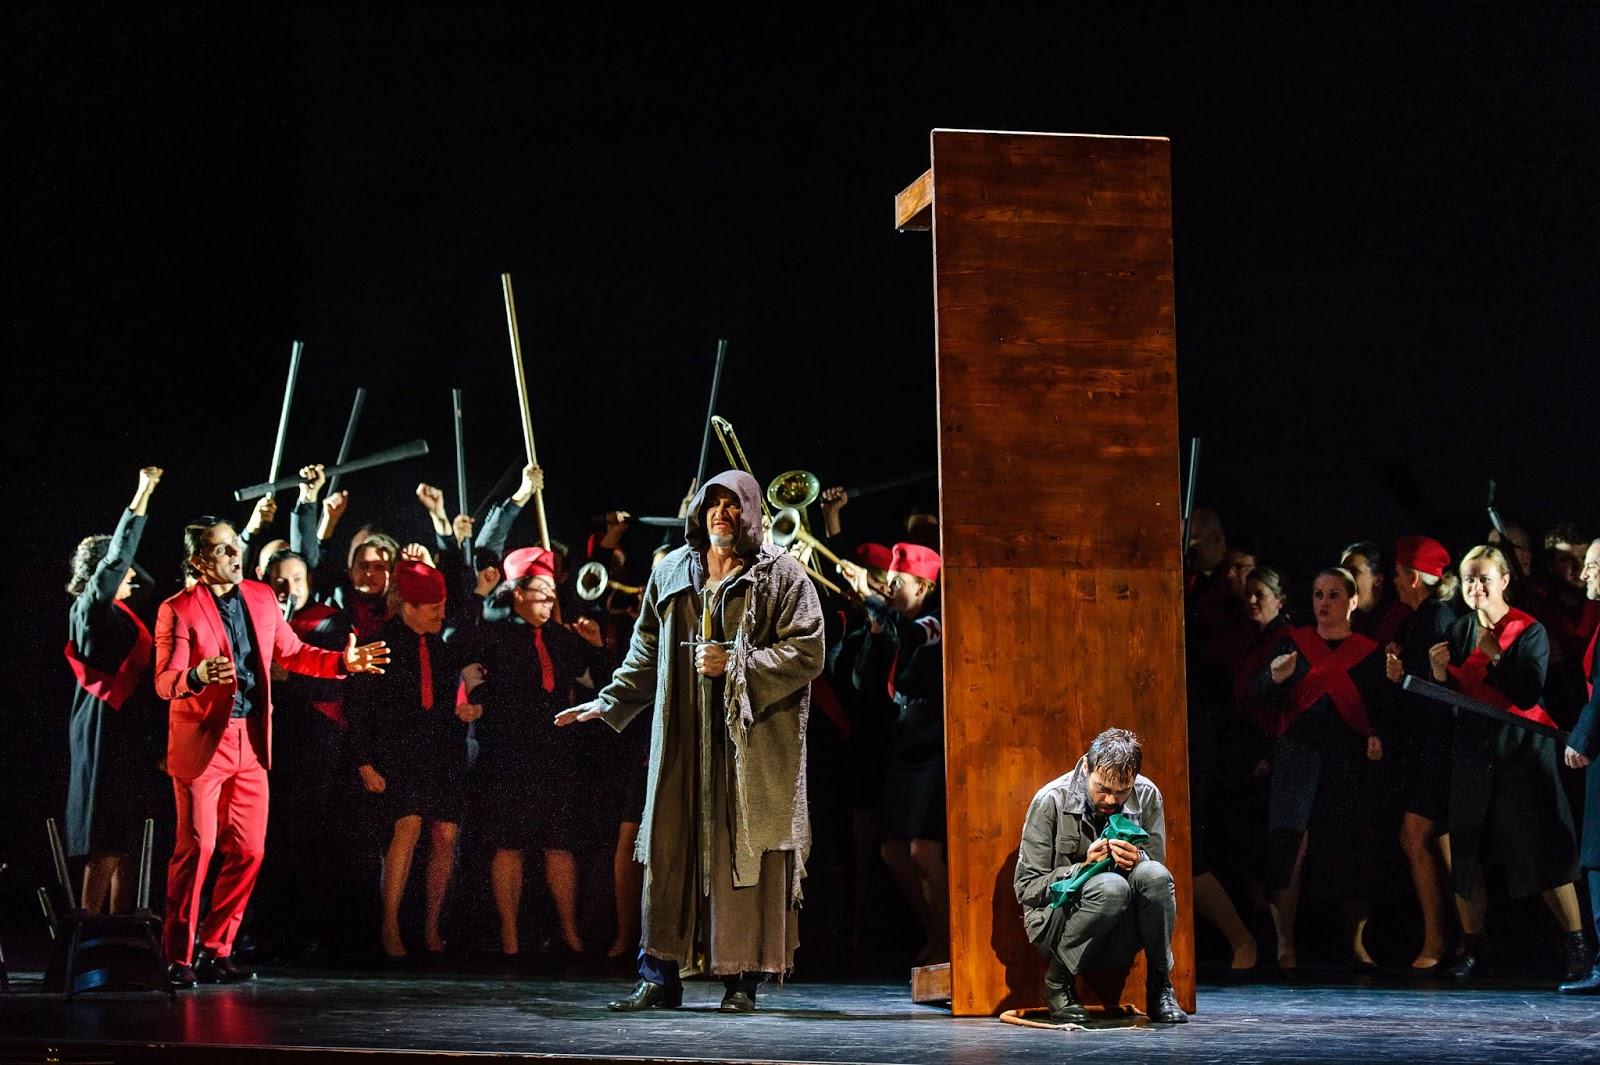 Lithe & musically engaging: Verdi's I Lombardi from the Heidenheim Opera Festival